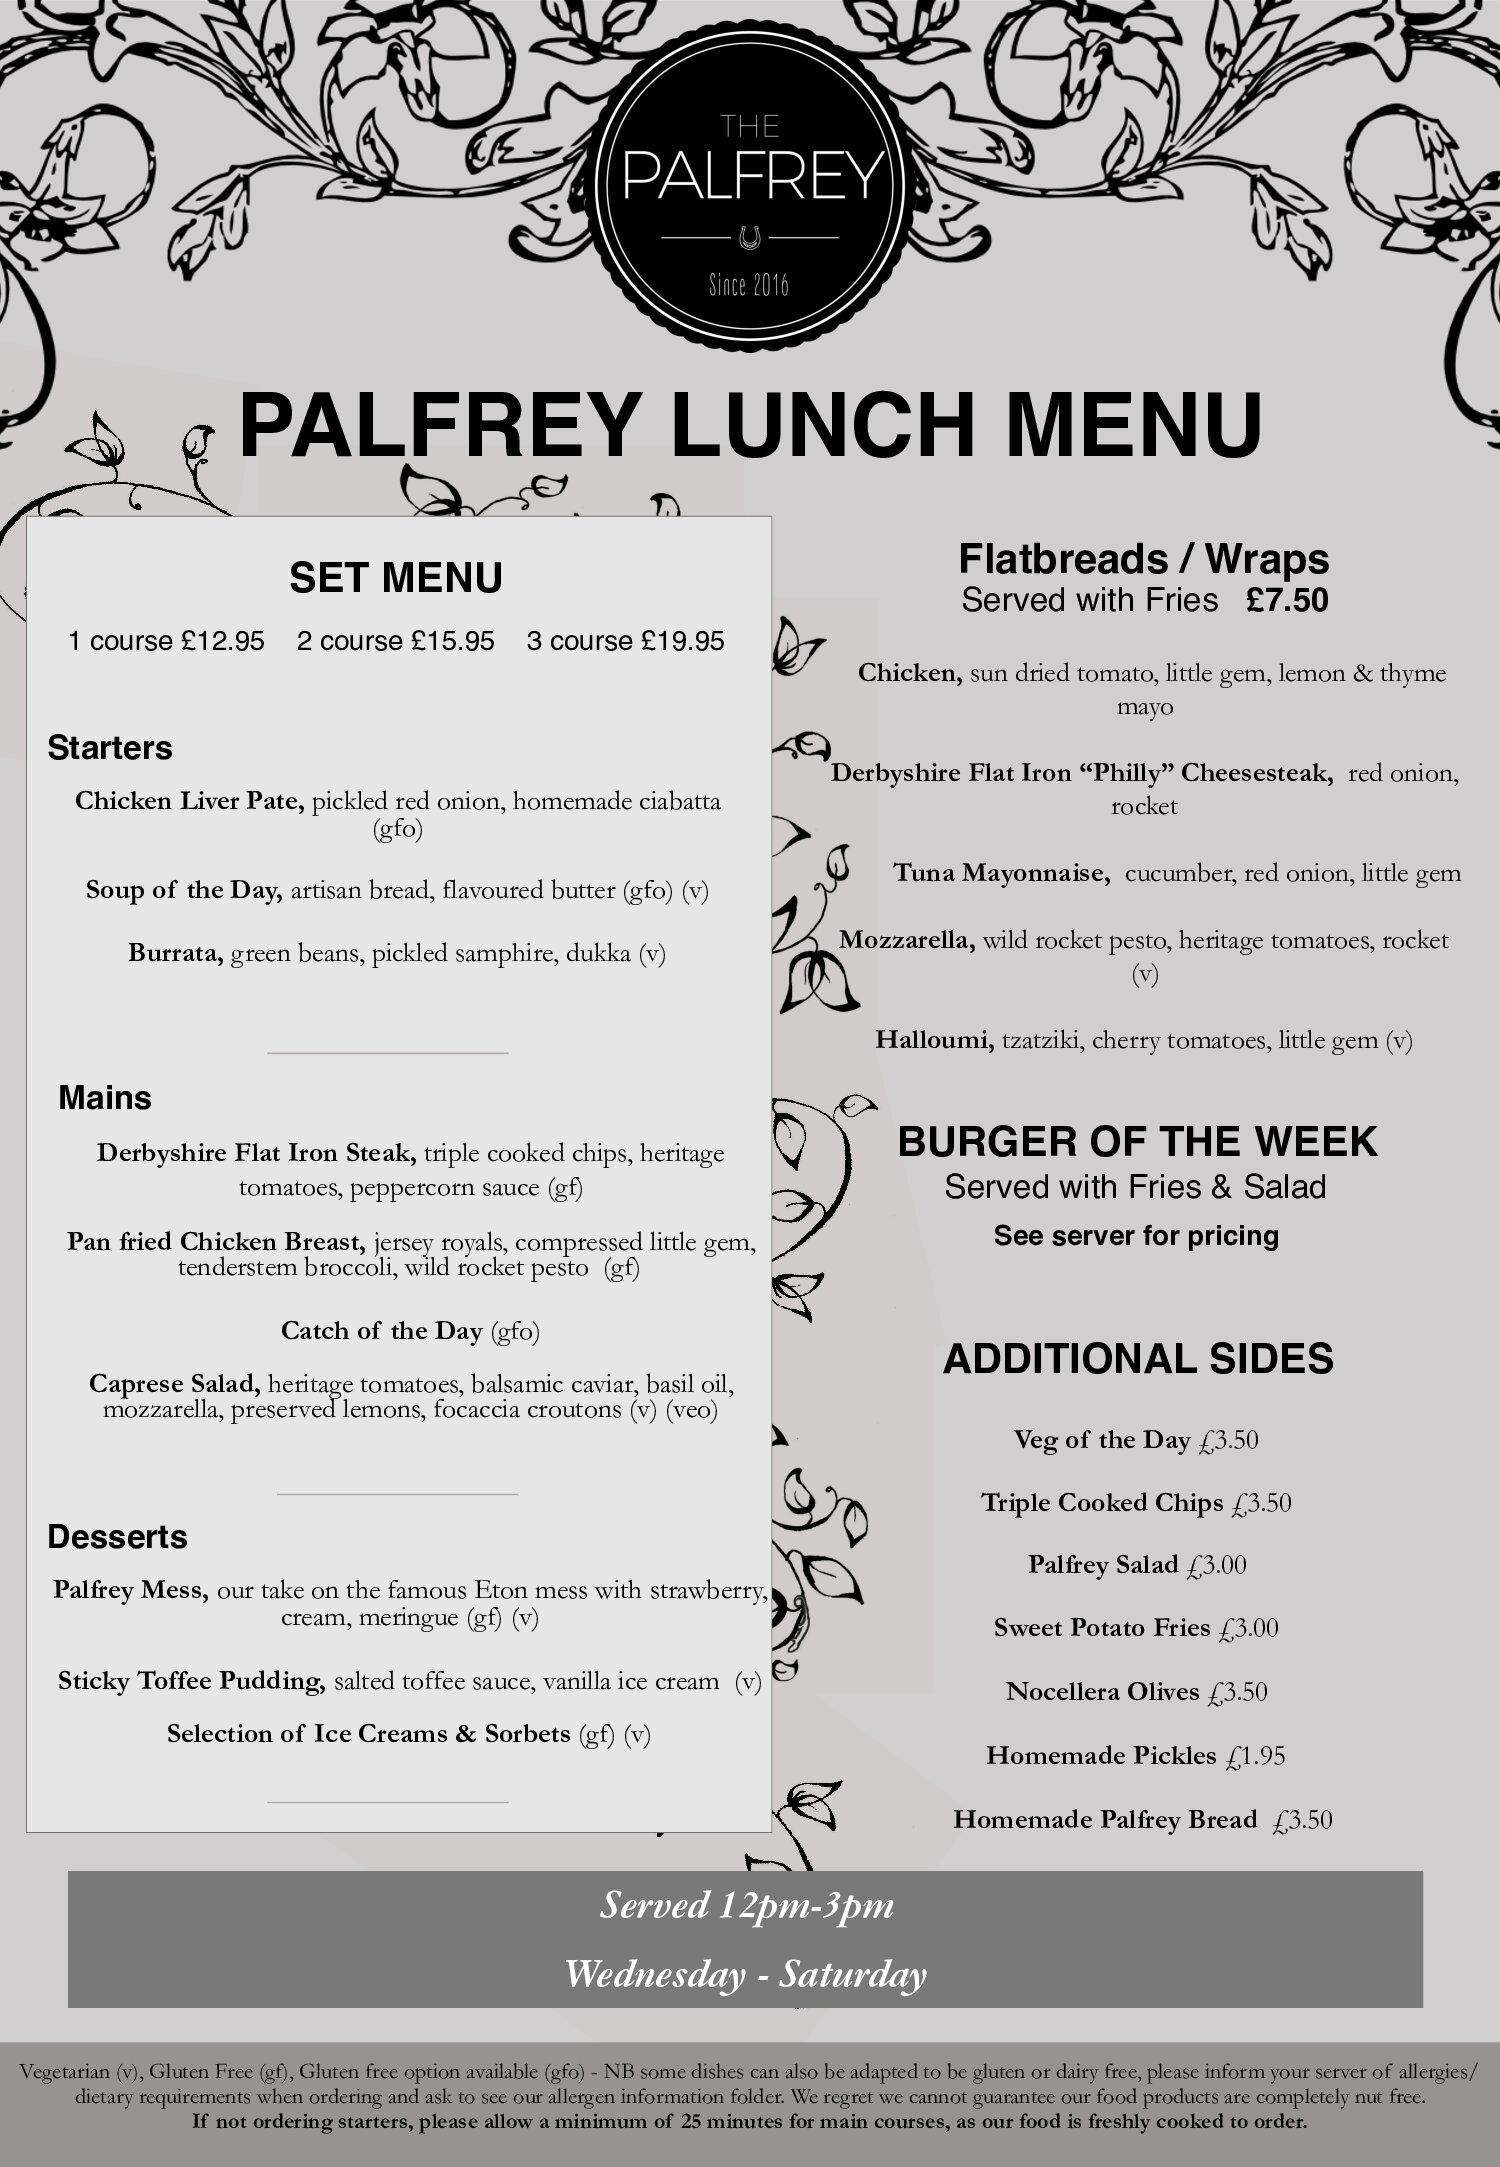 Palfrey Menu - Summer 2019 Lunch_1-1